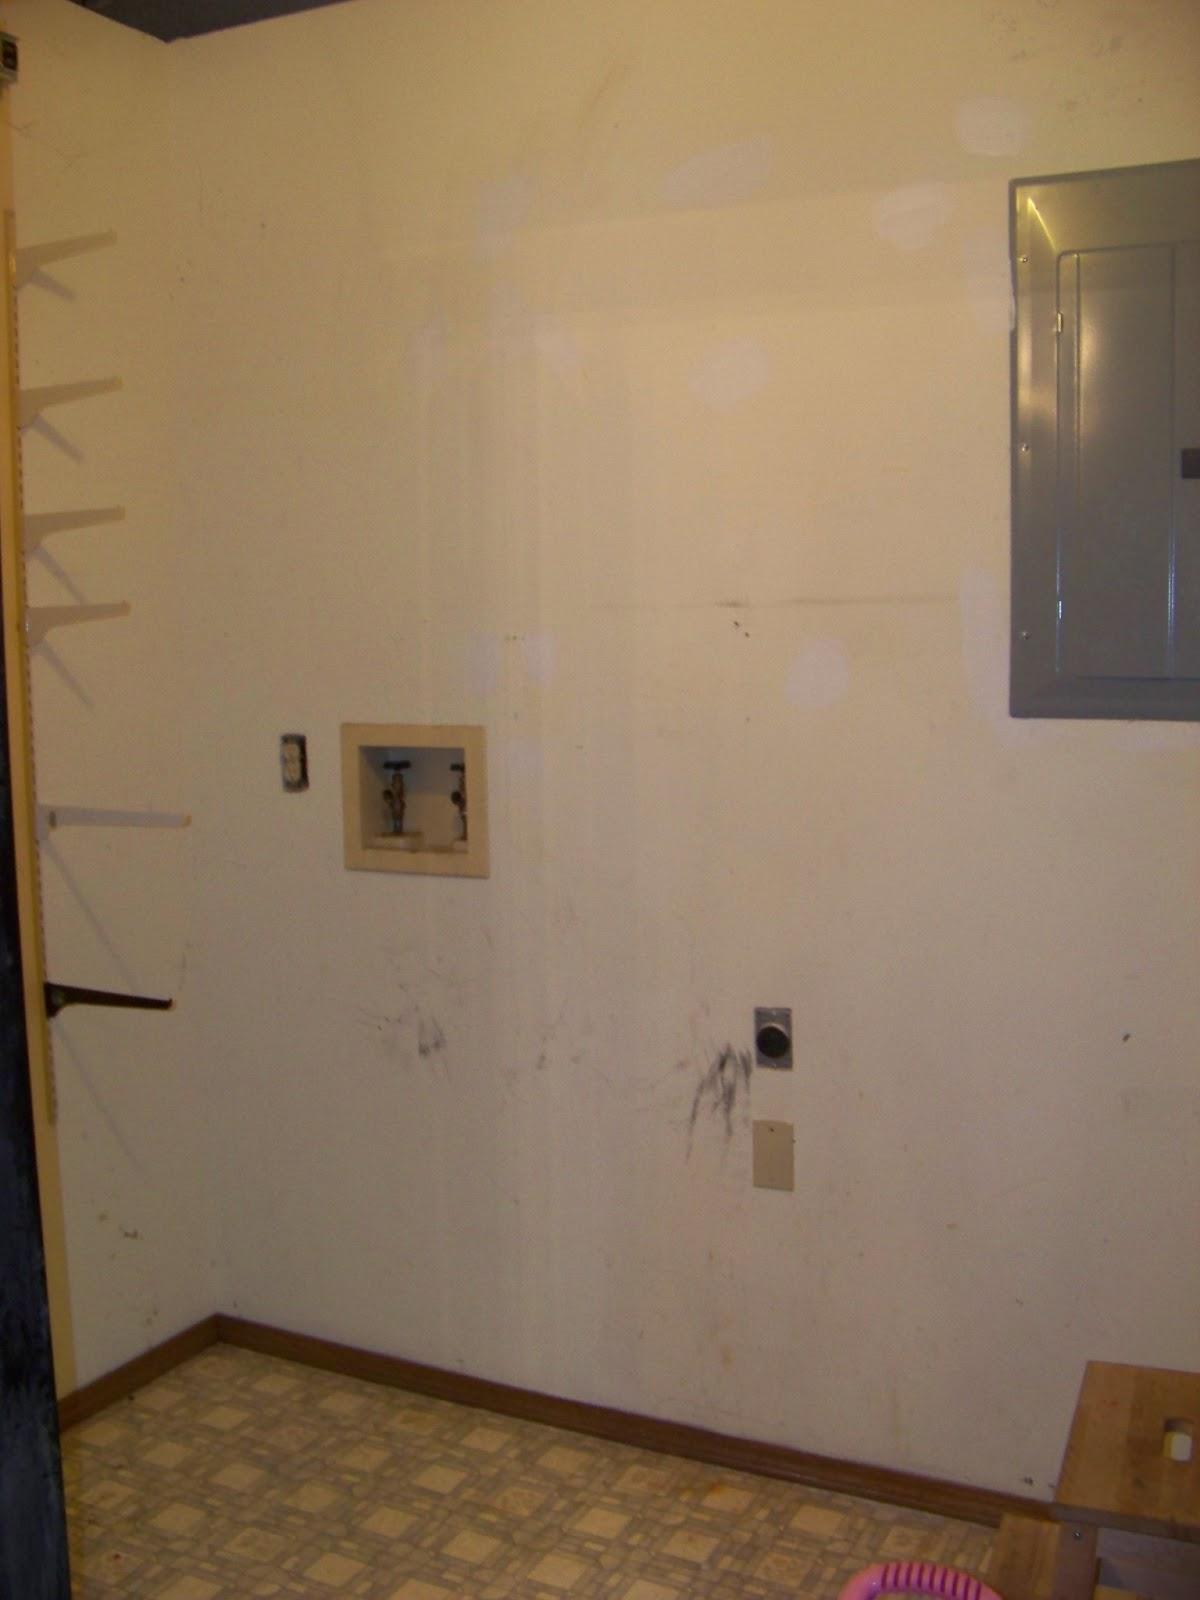 The Sunset Lane Black Laundry Room Pantry Reveal